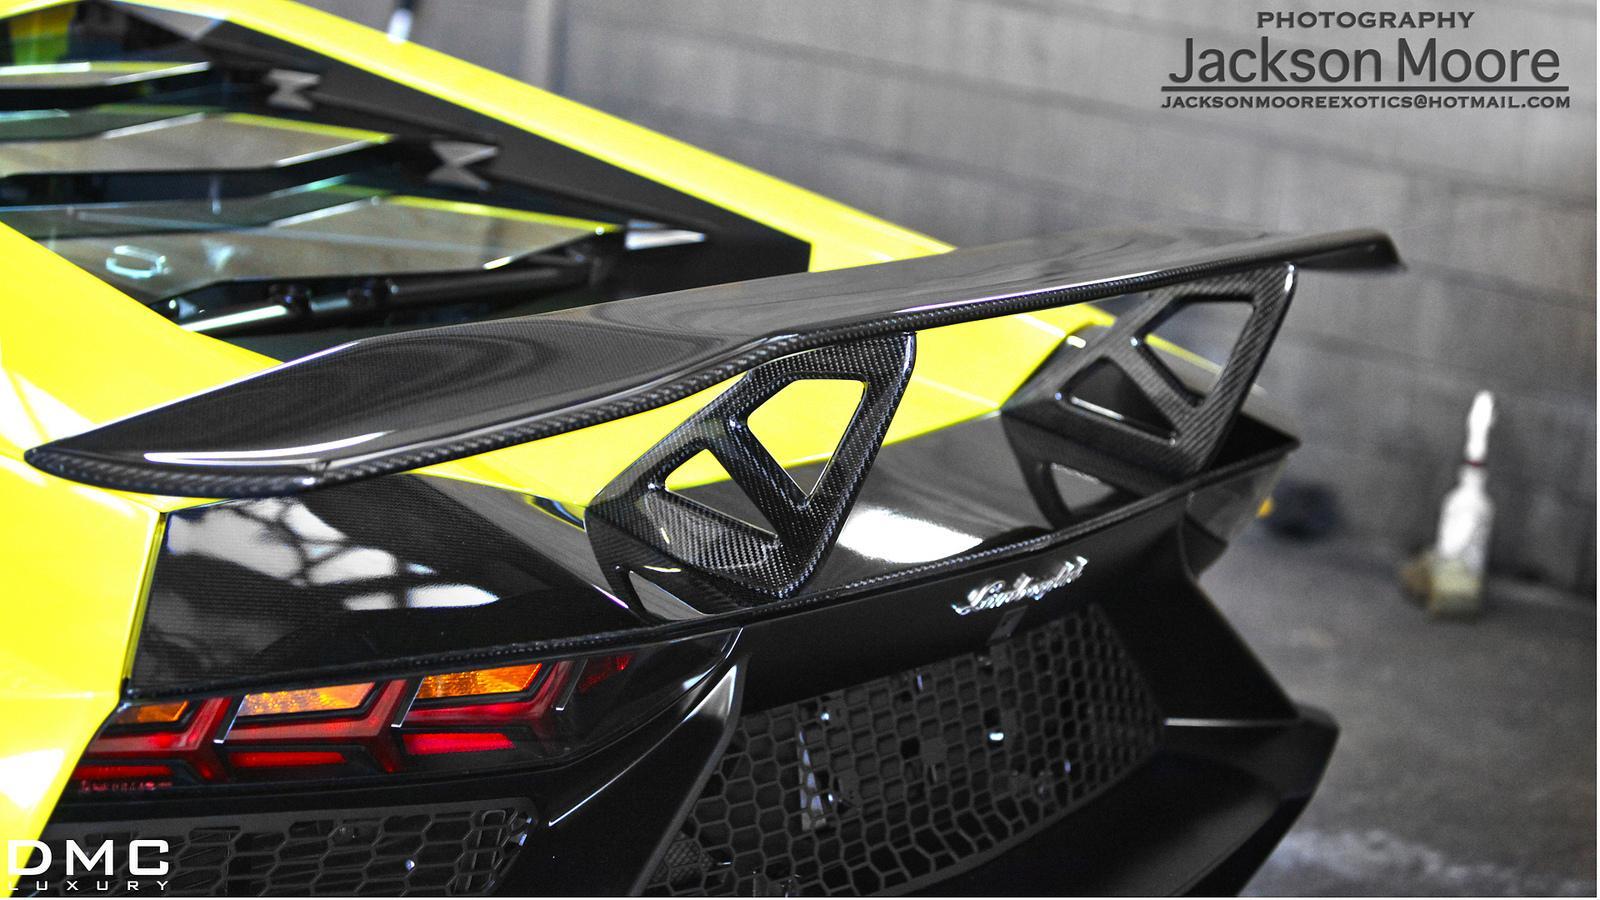 Lamborghini Aventador Lp720 4 50 Anniversario Receives Dmc Rear Wing